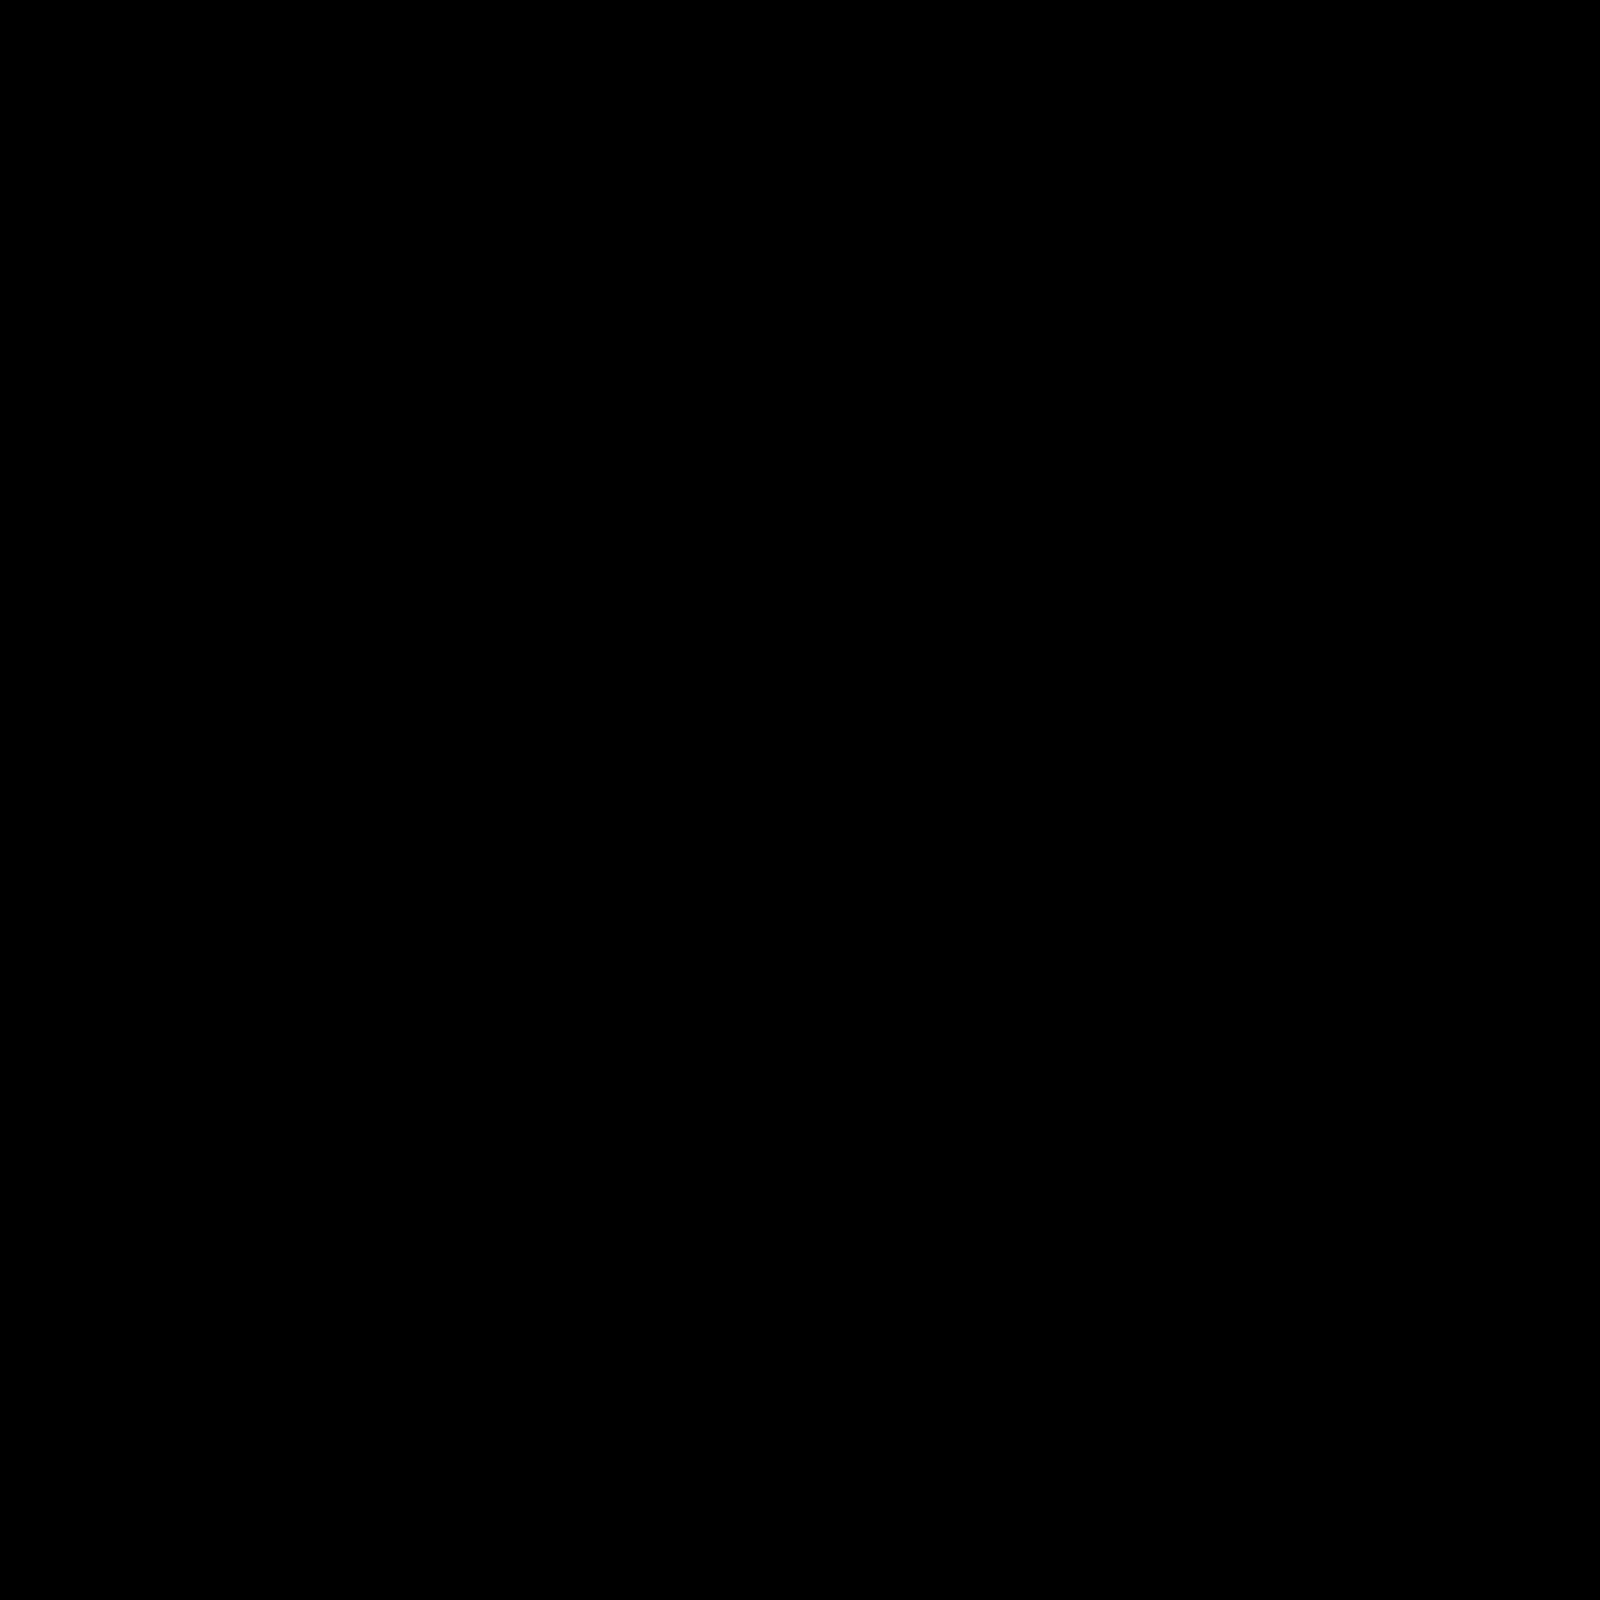 Play Record icon